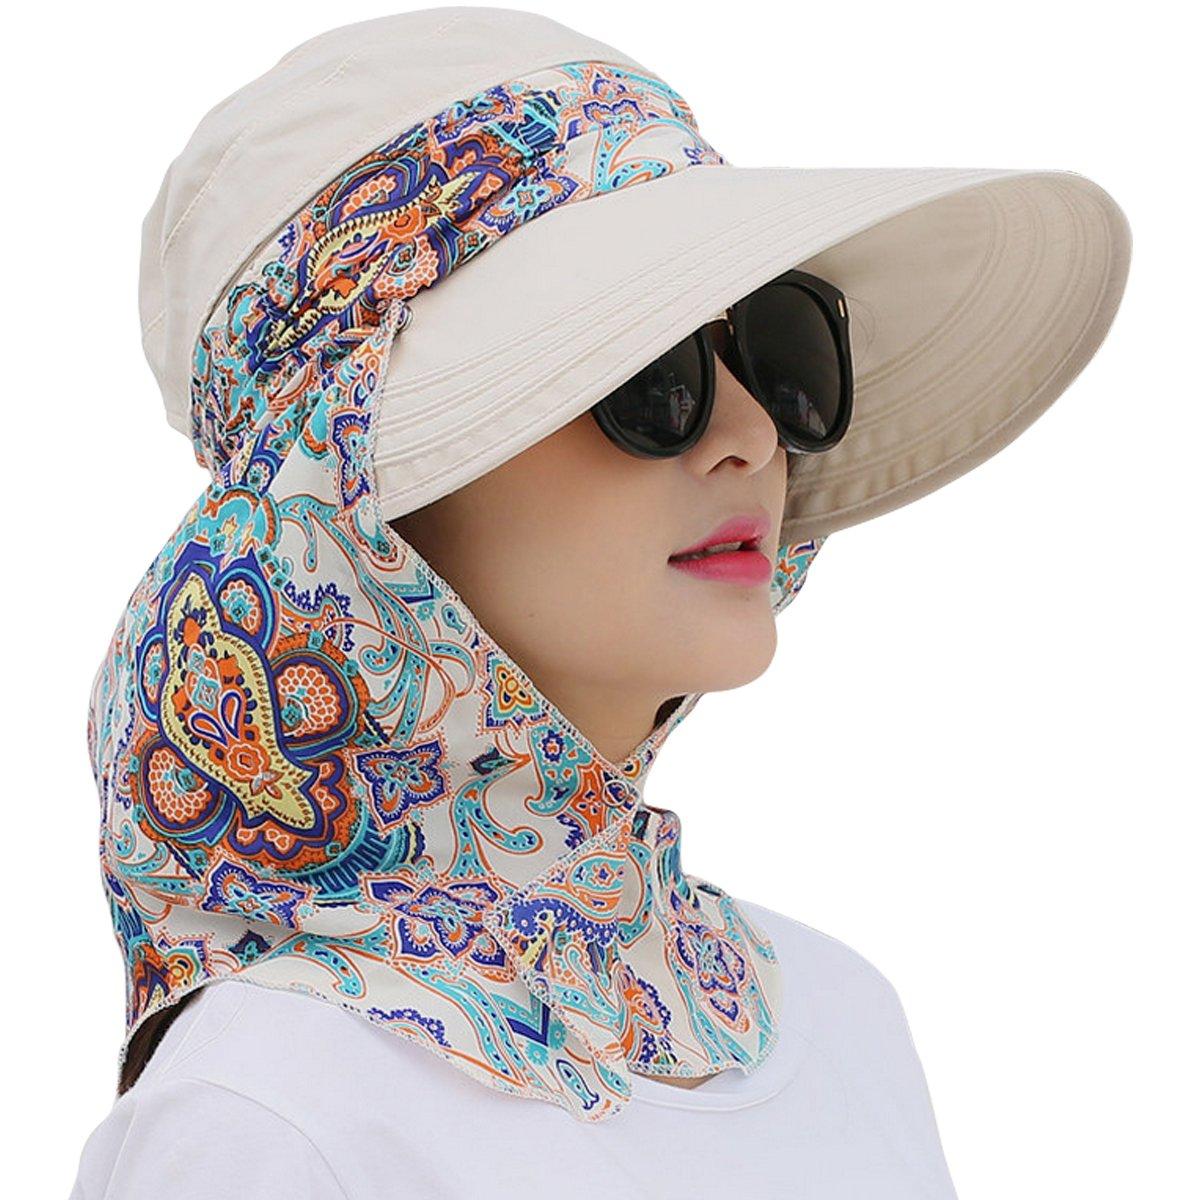 Lanzom Women Lady Wide Brim Cap Visor Hats UV Protection Summer Sun Hats ( White)  Home  Amazon.com.au c9a06da39ddc